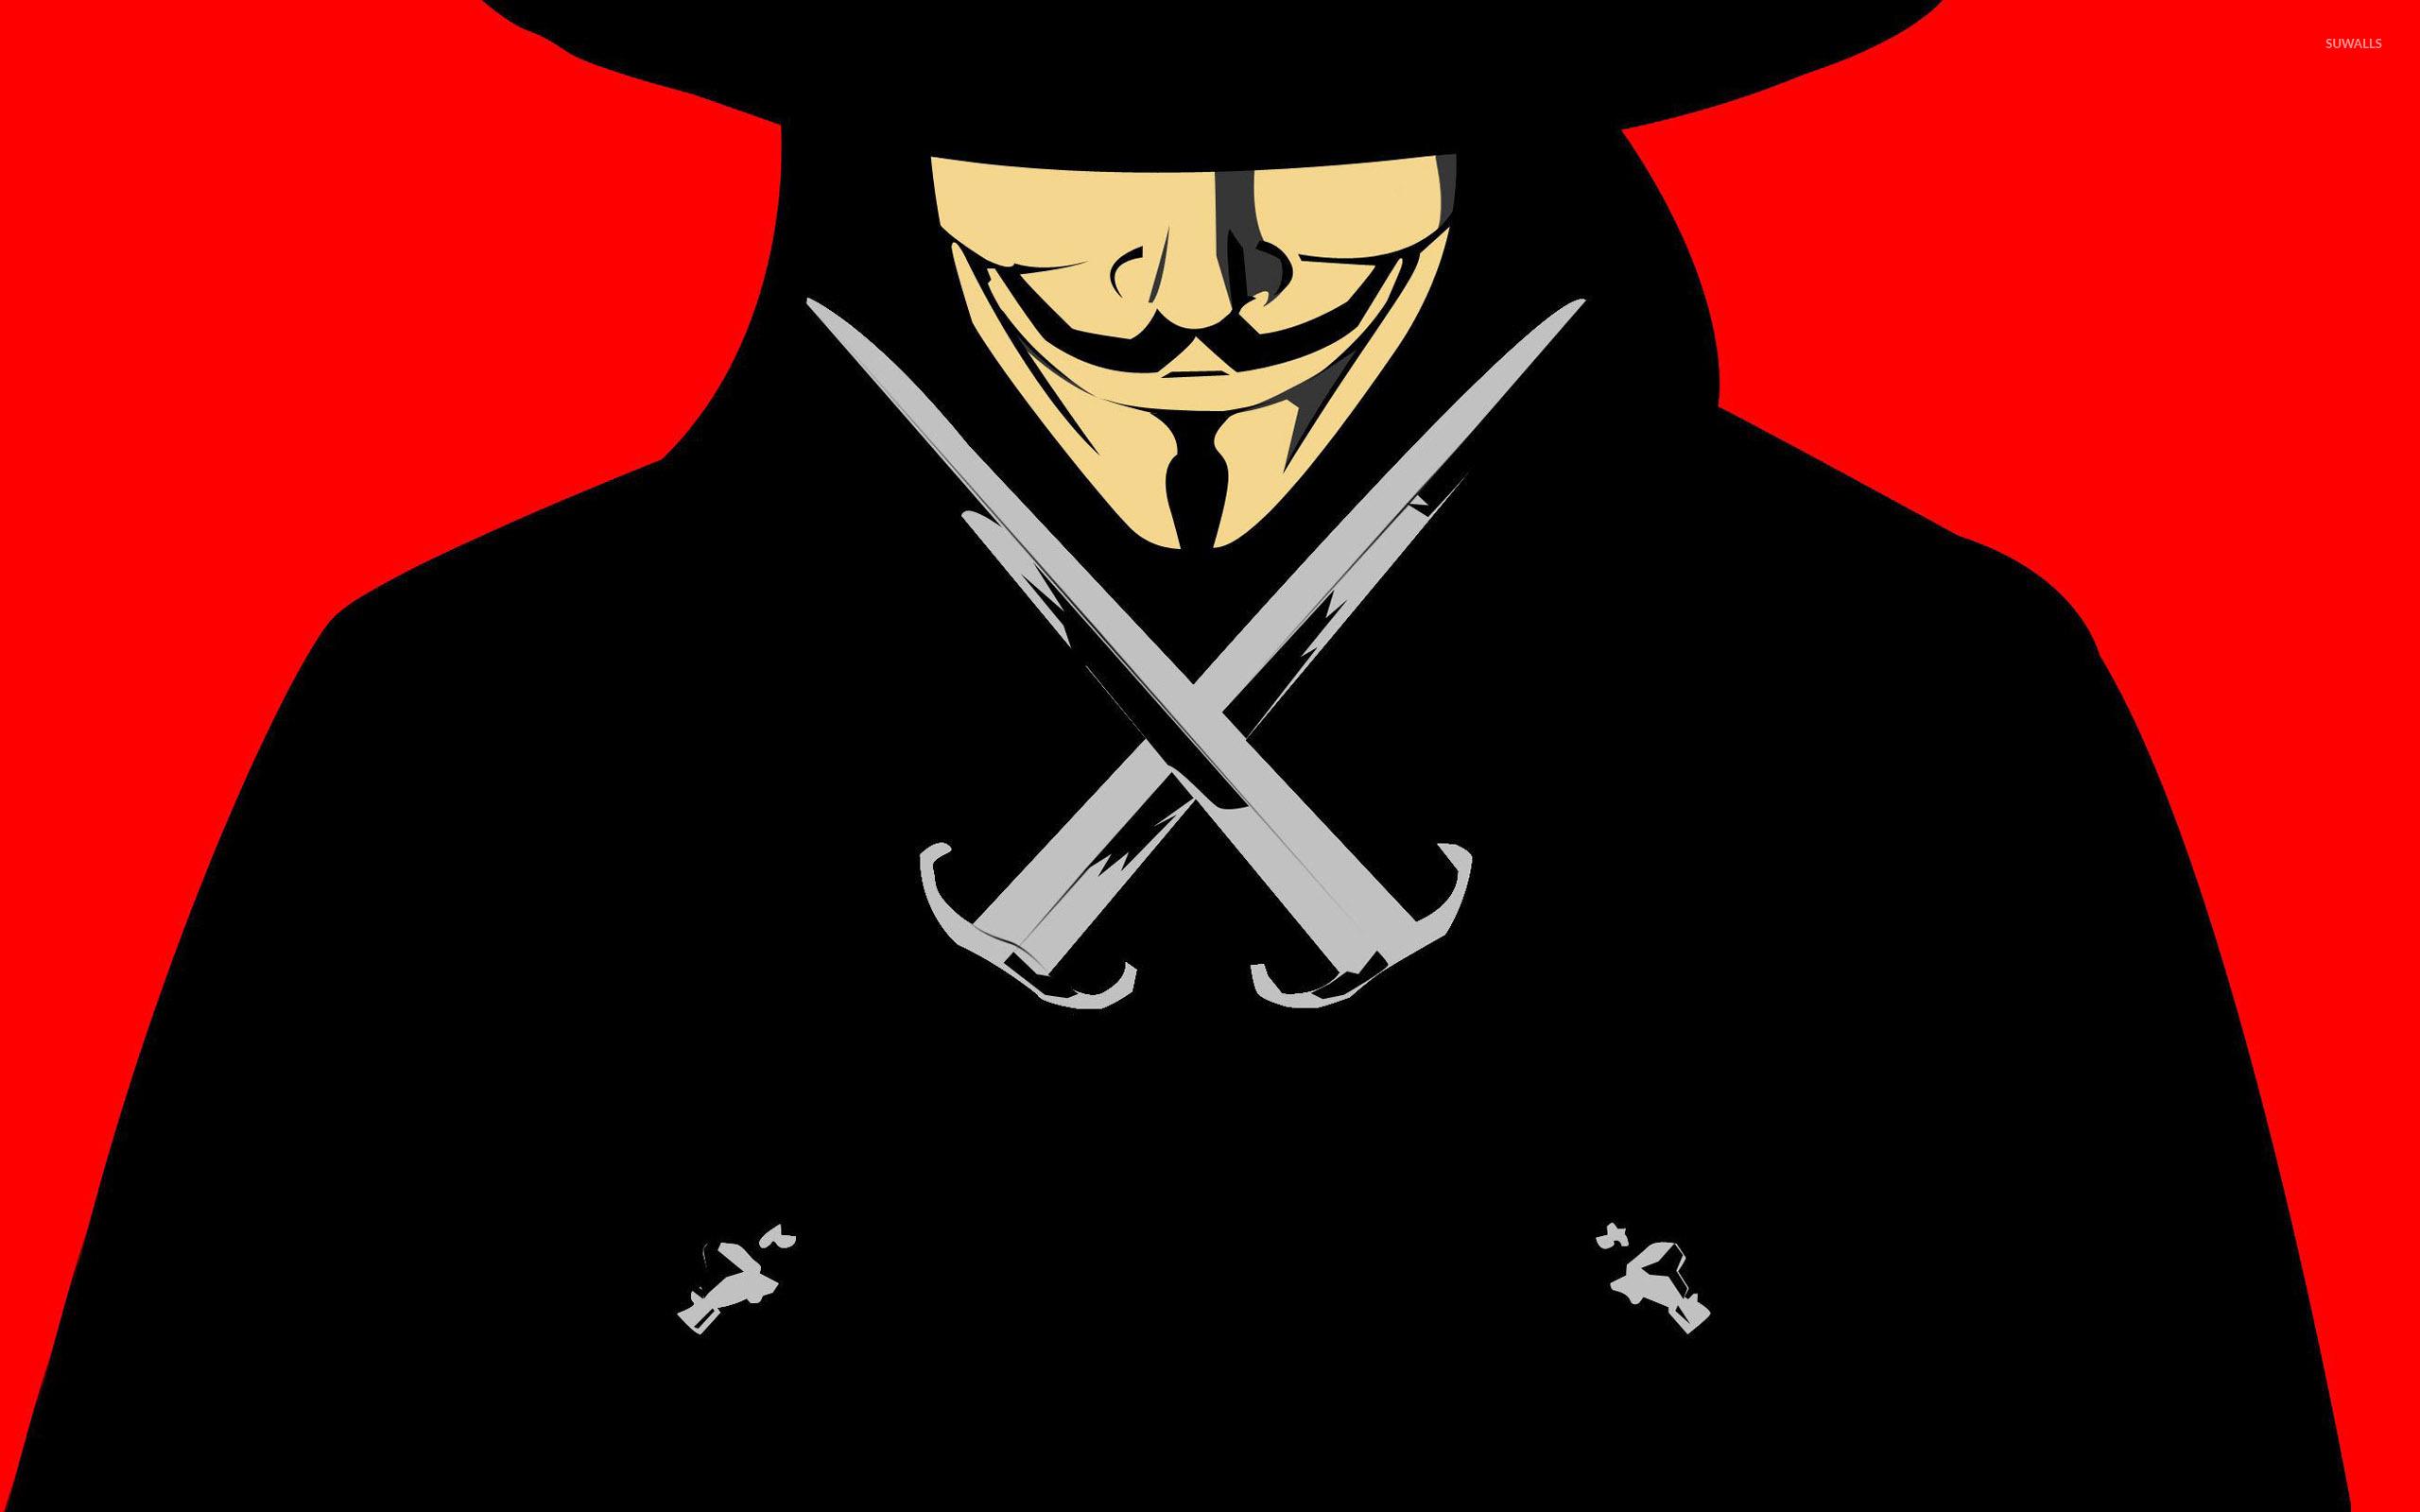 V For Vendetta Wallpaper Vector Wallpapers 27619